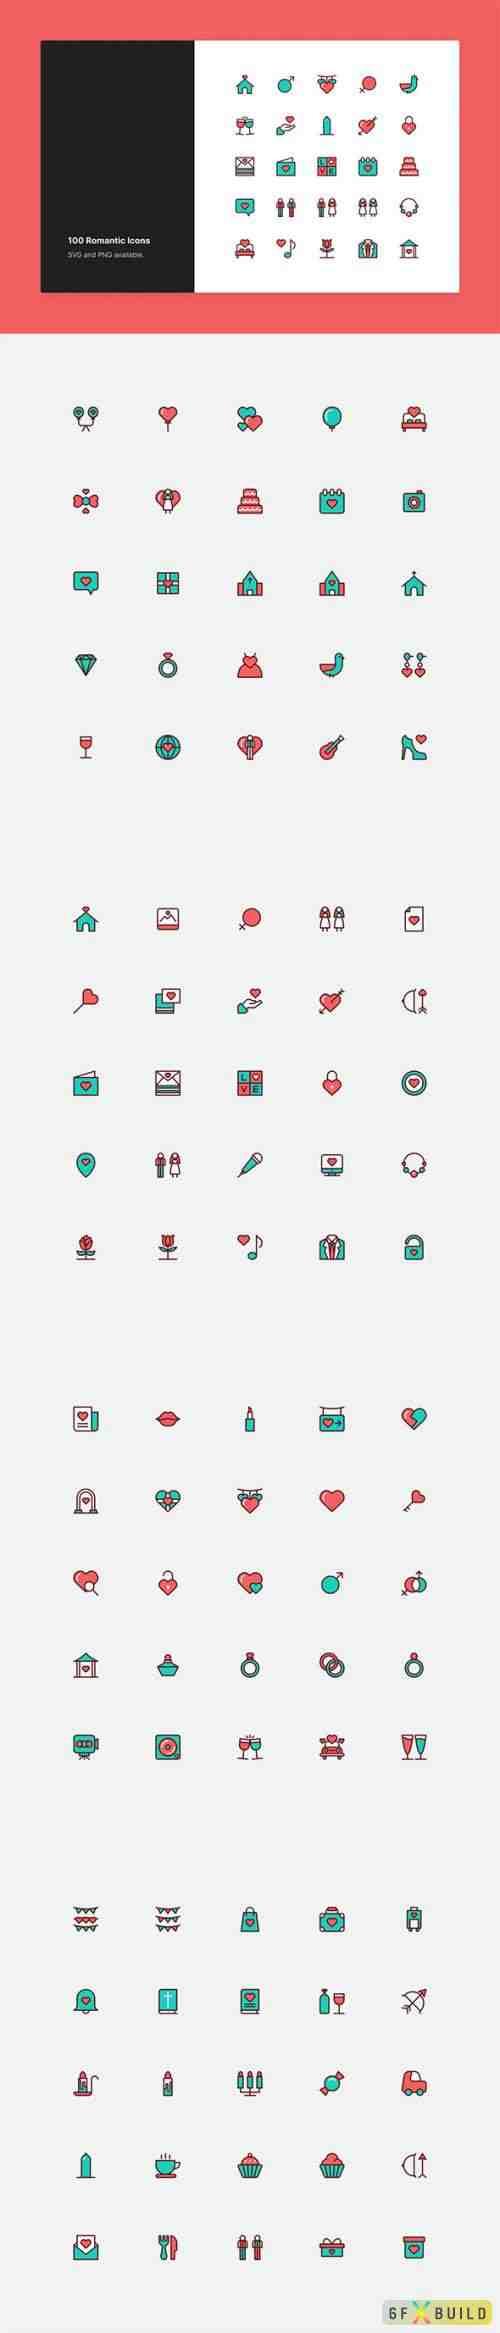 Romantic & Love Icon Set - Color Style